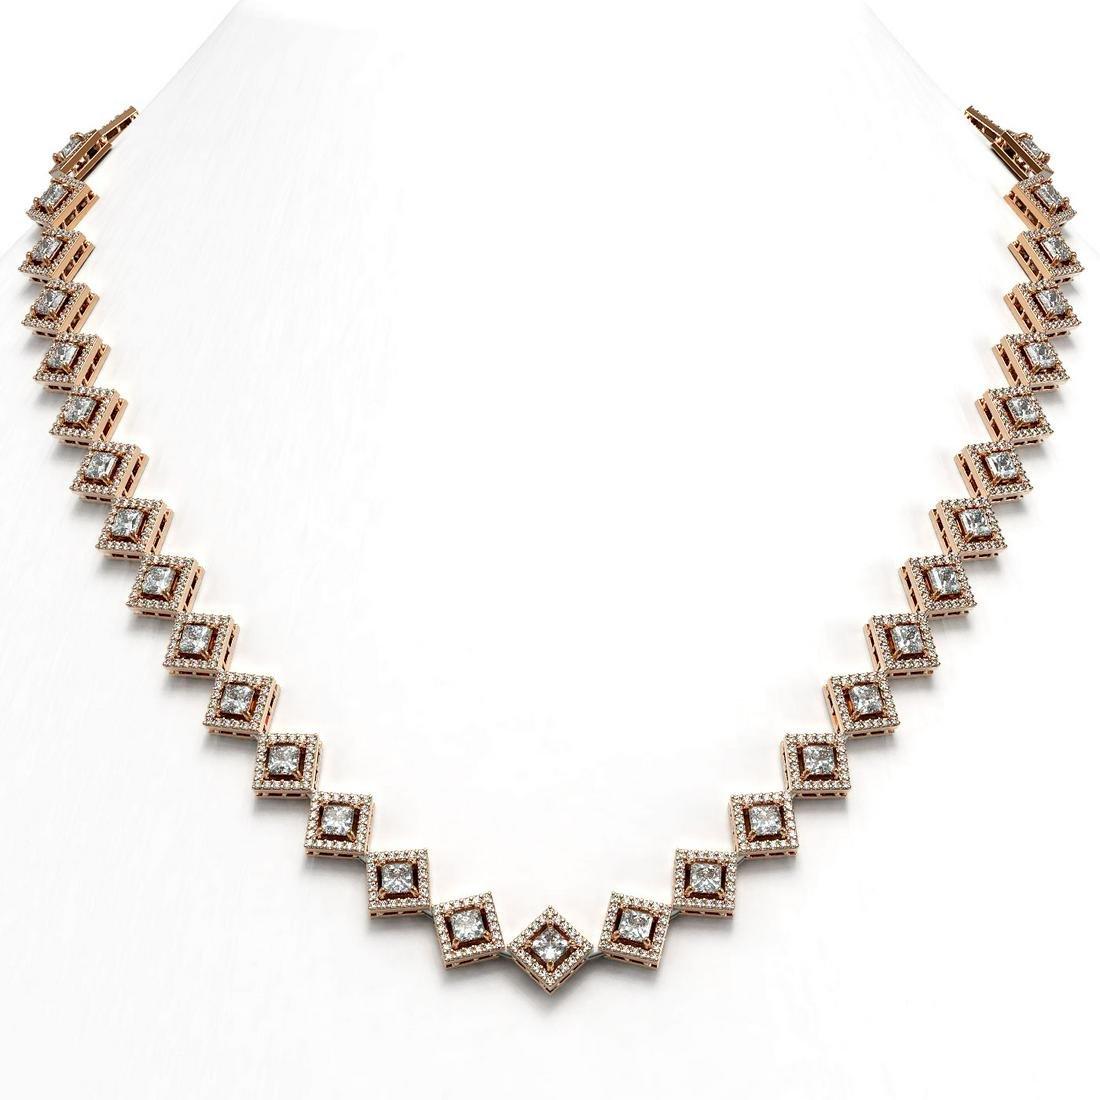 19.27 ctw Princess Diamond Necklace 18K Rose Gold